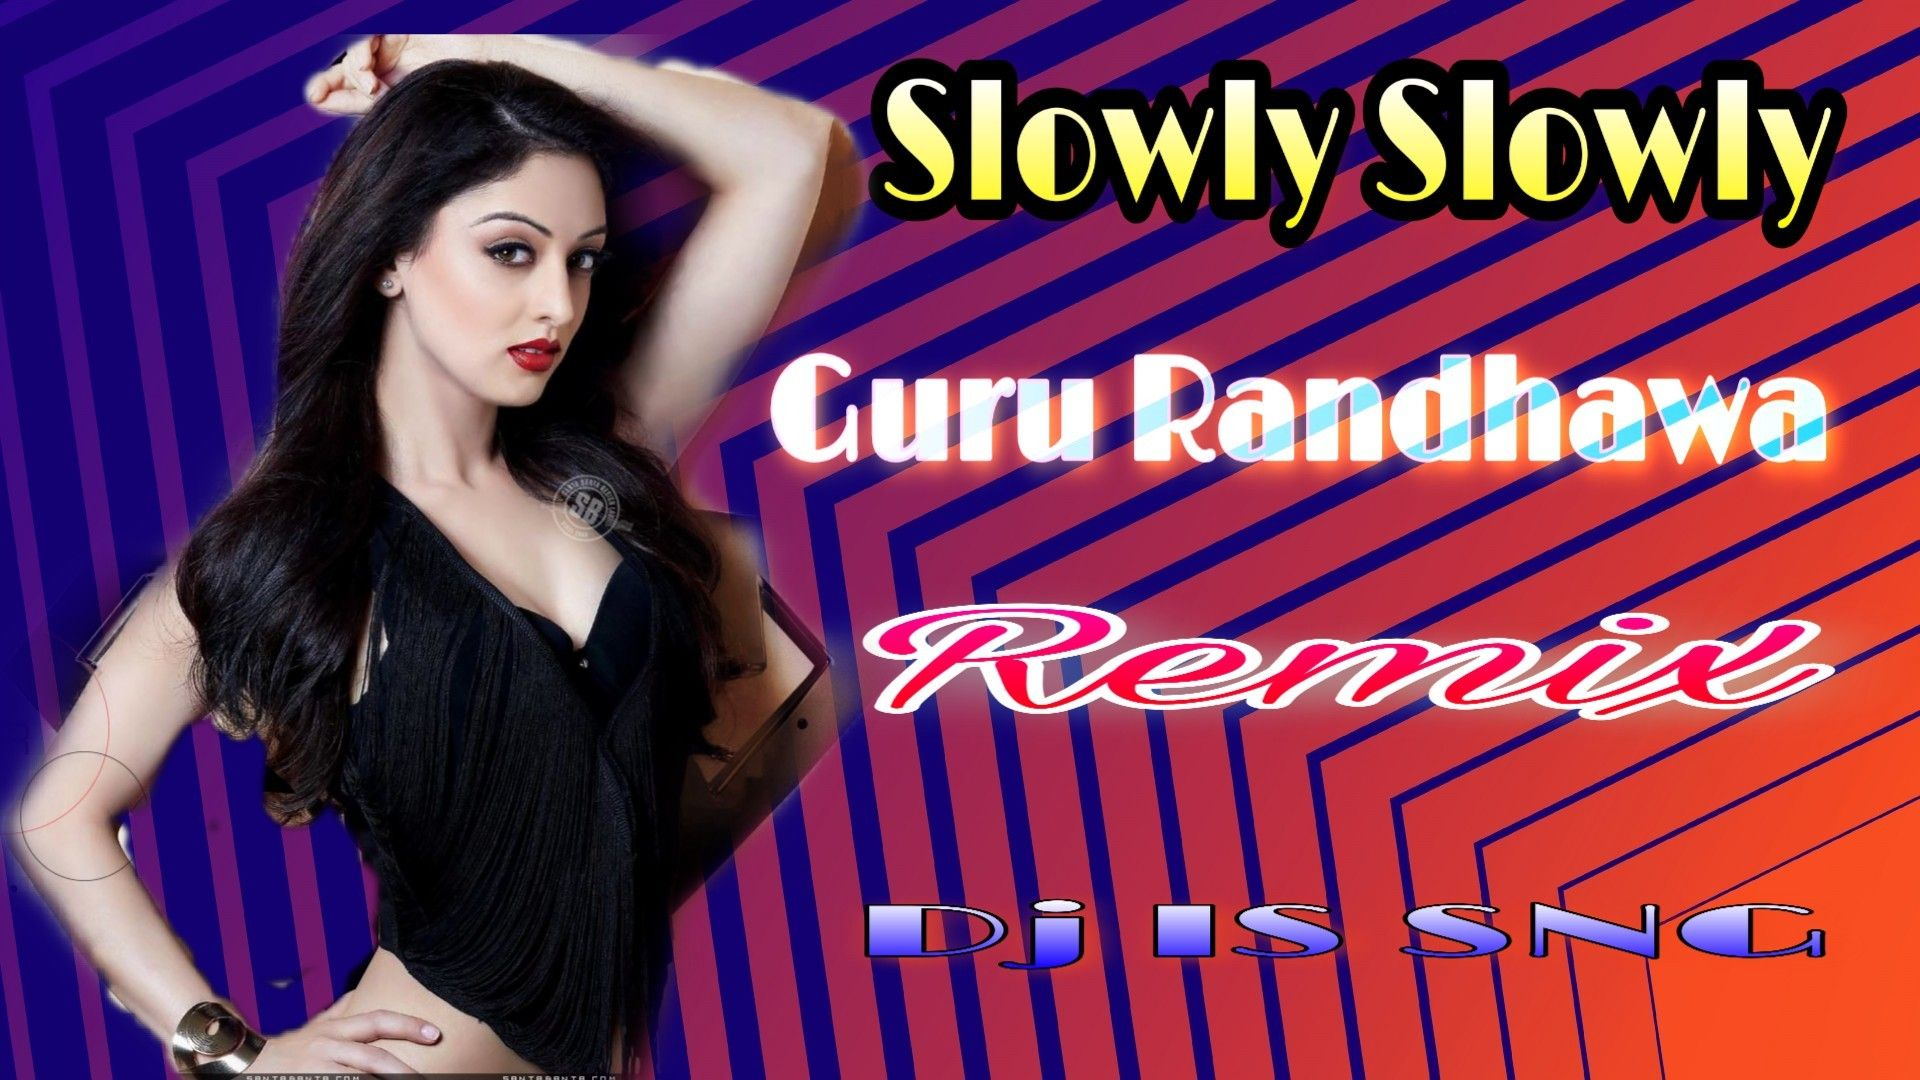 Slowly Slowly Guru Randhawa Ft Pitbull Dhanashree Verma Youtube Latest Song Lyrics Pitbull Albums Dj Shadow